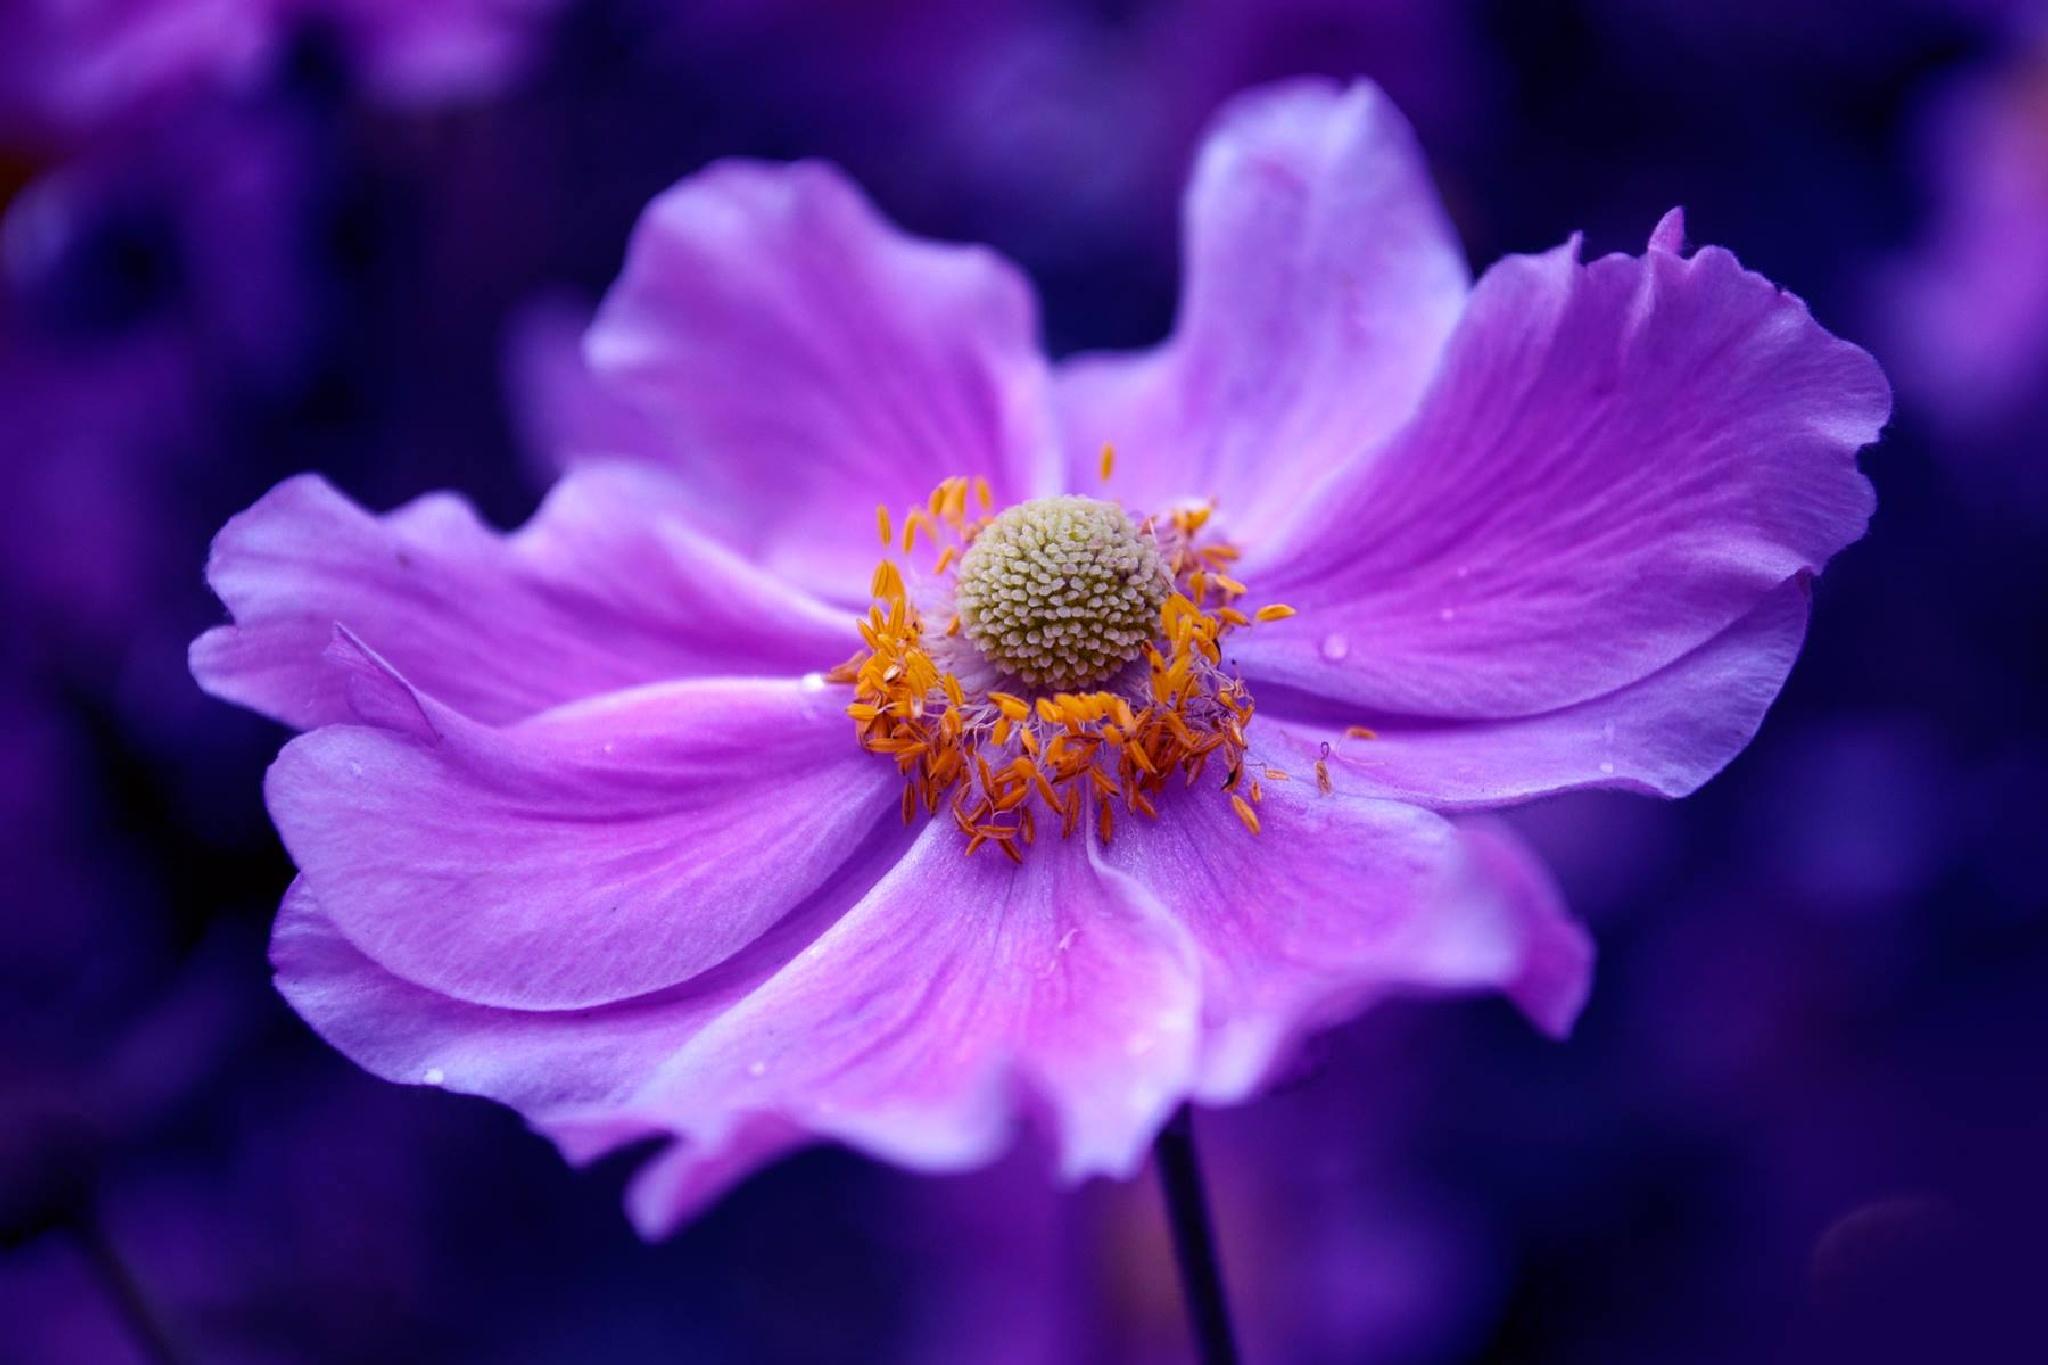 Flower by Britta Rogge